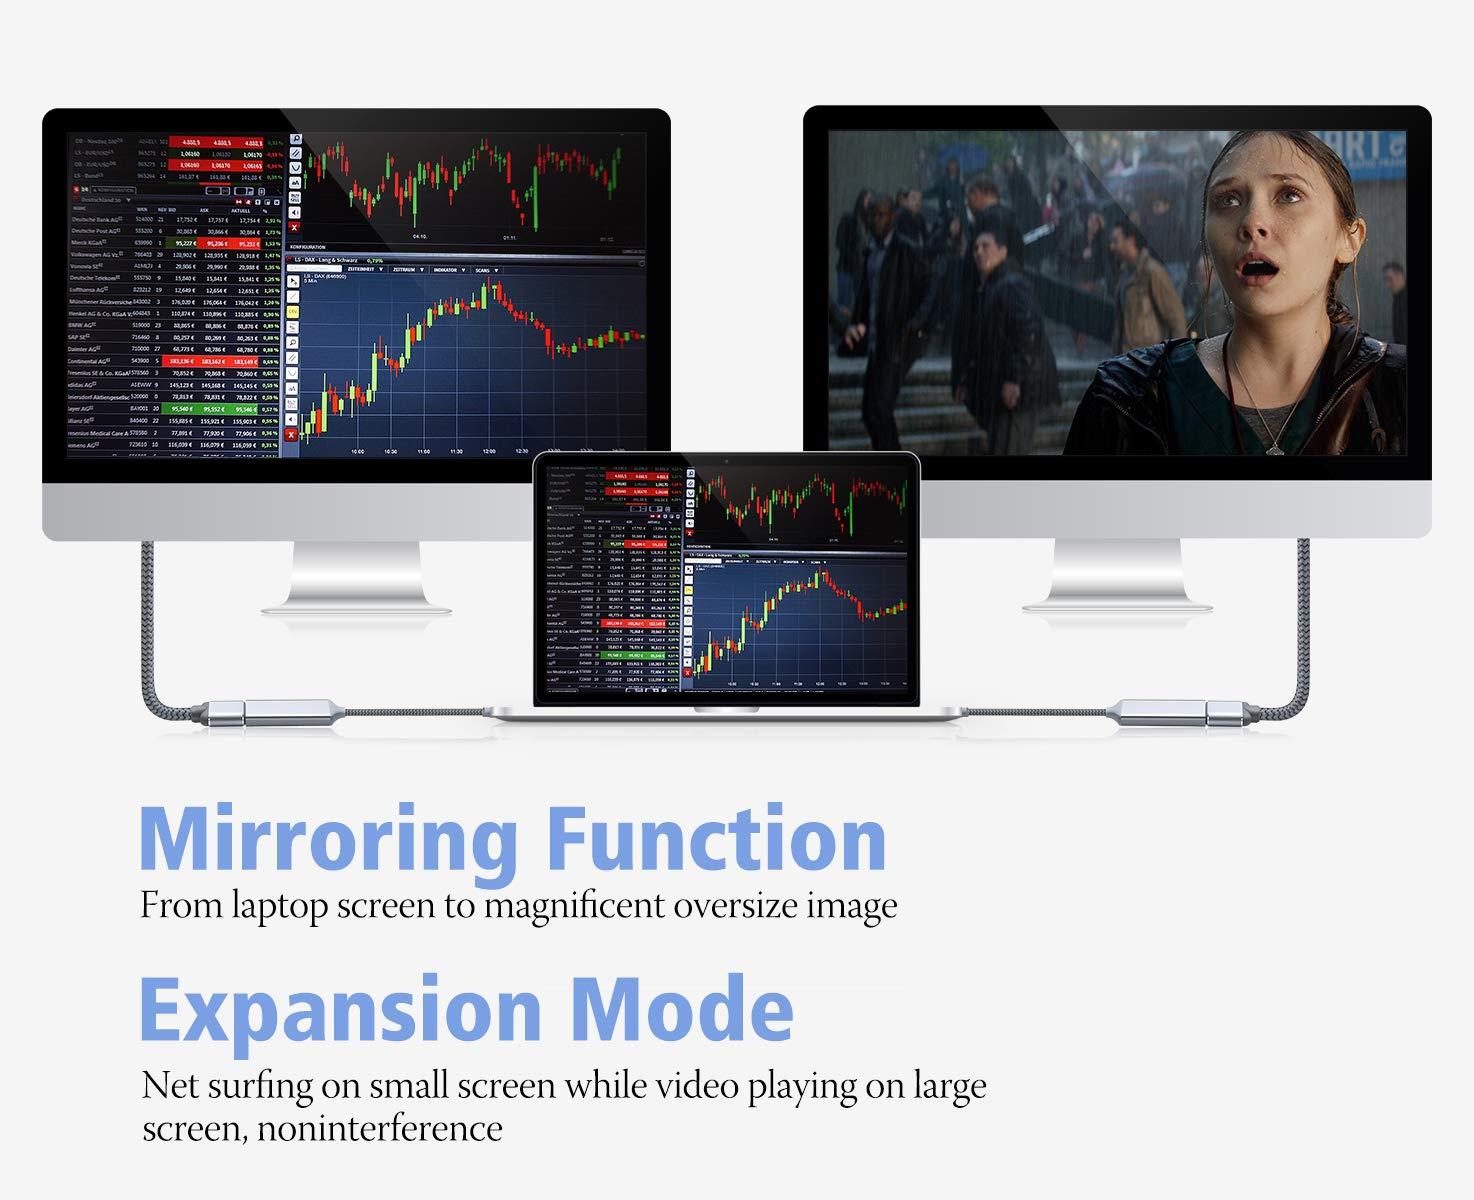 Highwings USB C to HDMI Adapter (4K@60Hz), Type C to HDMI Adapter,Thunderbolt 3 Compatible,Compatible Samsung Galaxy Note 9/S8/S9 Plus/Note8,Surfacebook 2, Pixelbook,2017 MacBook, 2017 iMac,Grey by Highwings (Image #5)